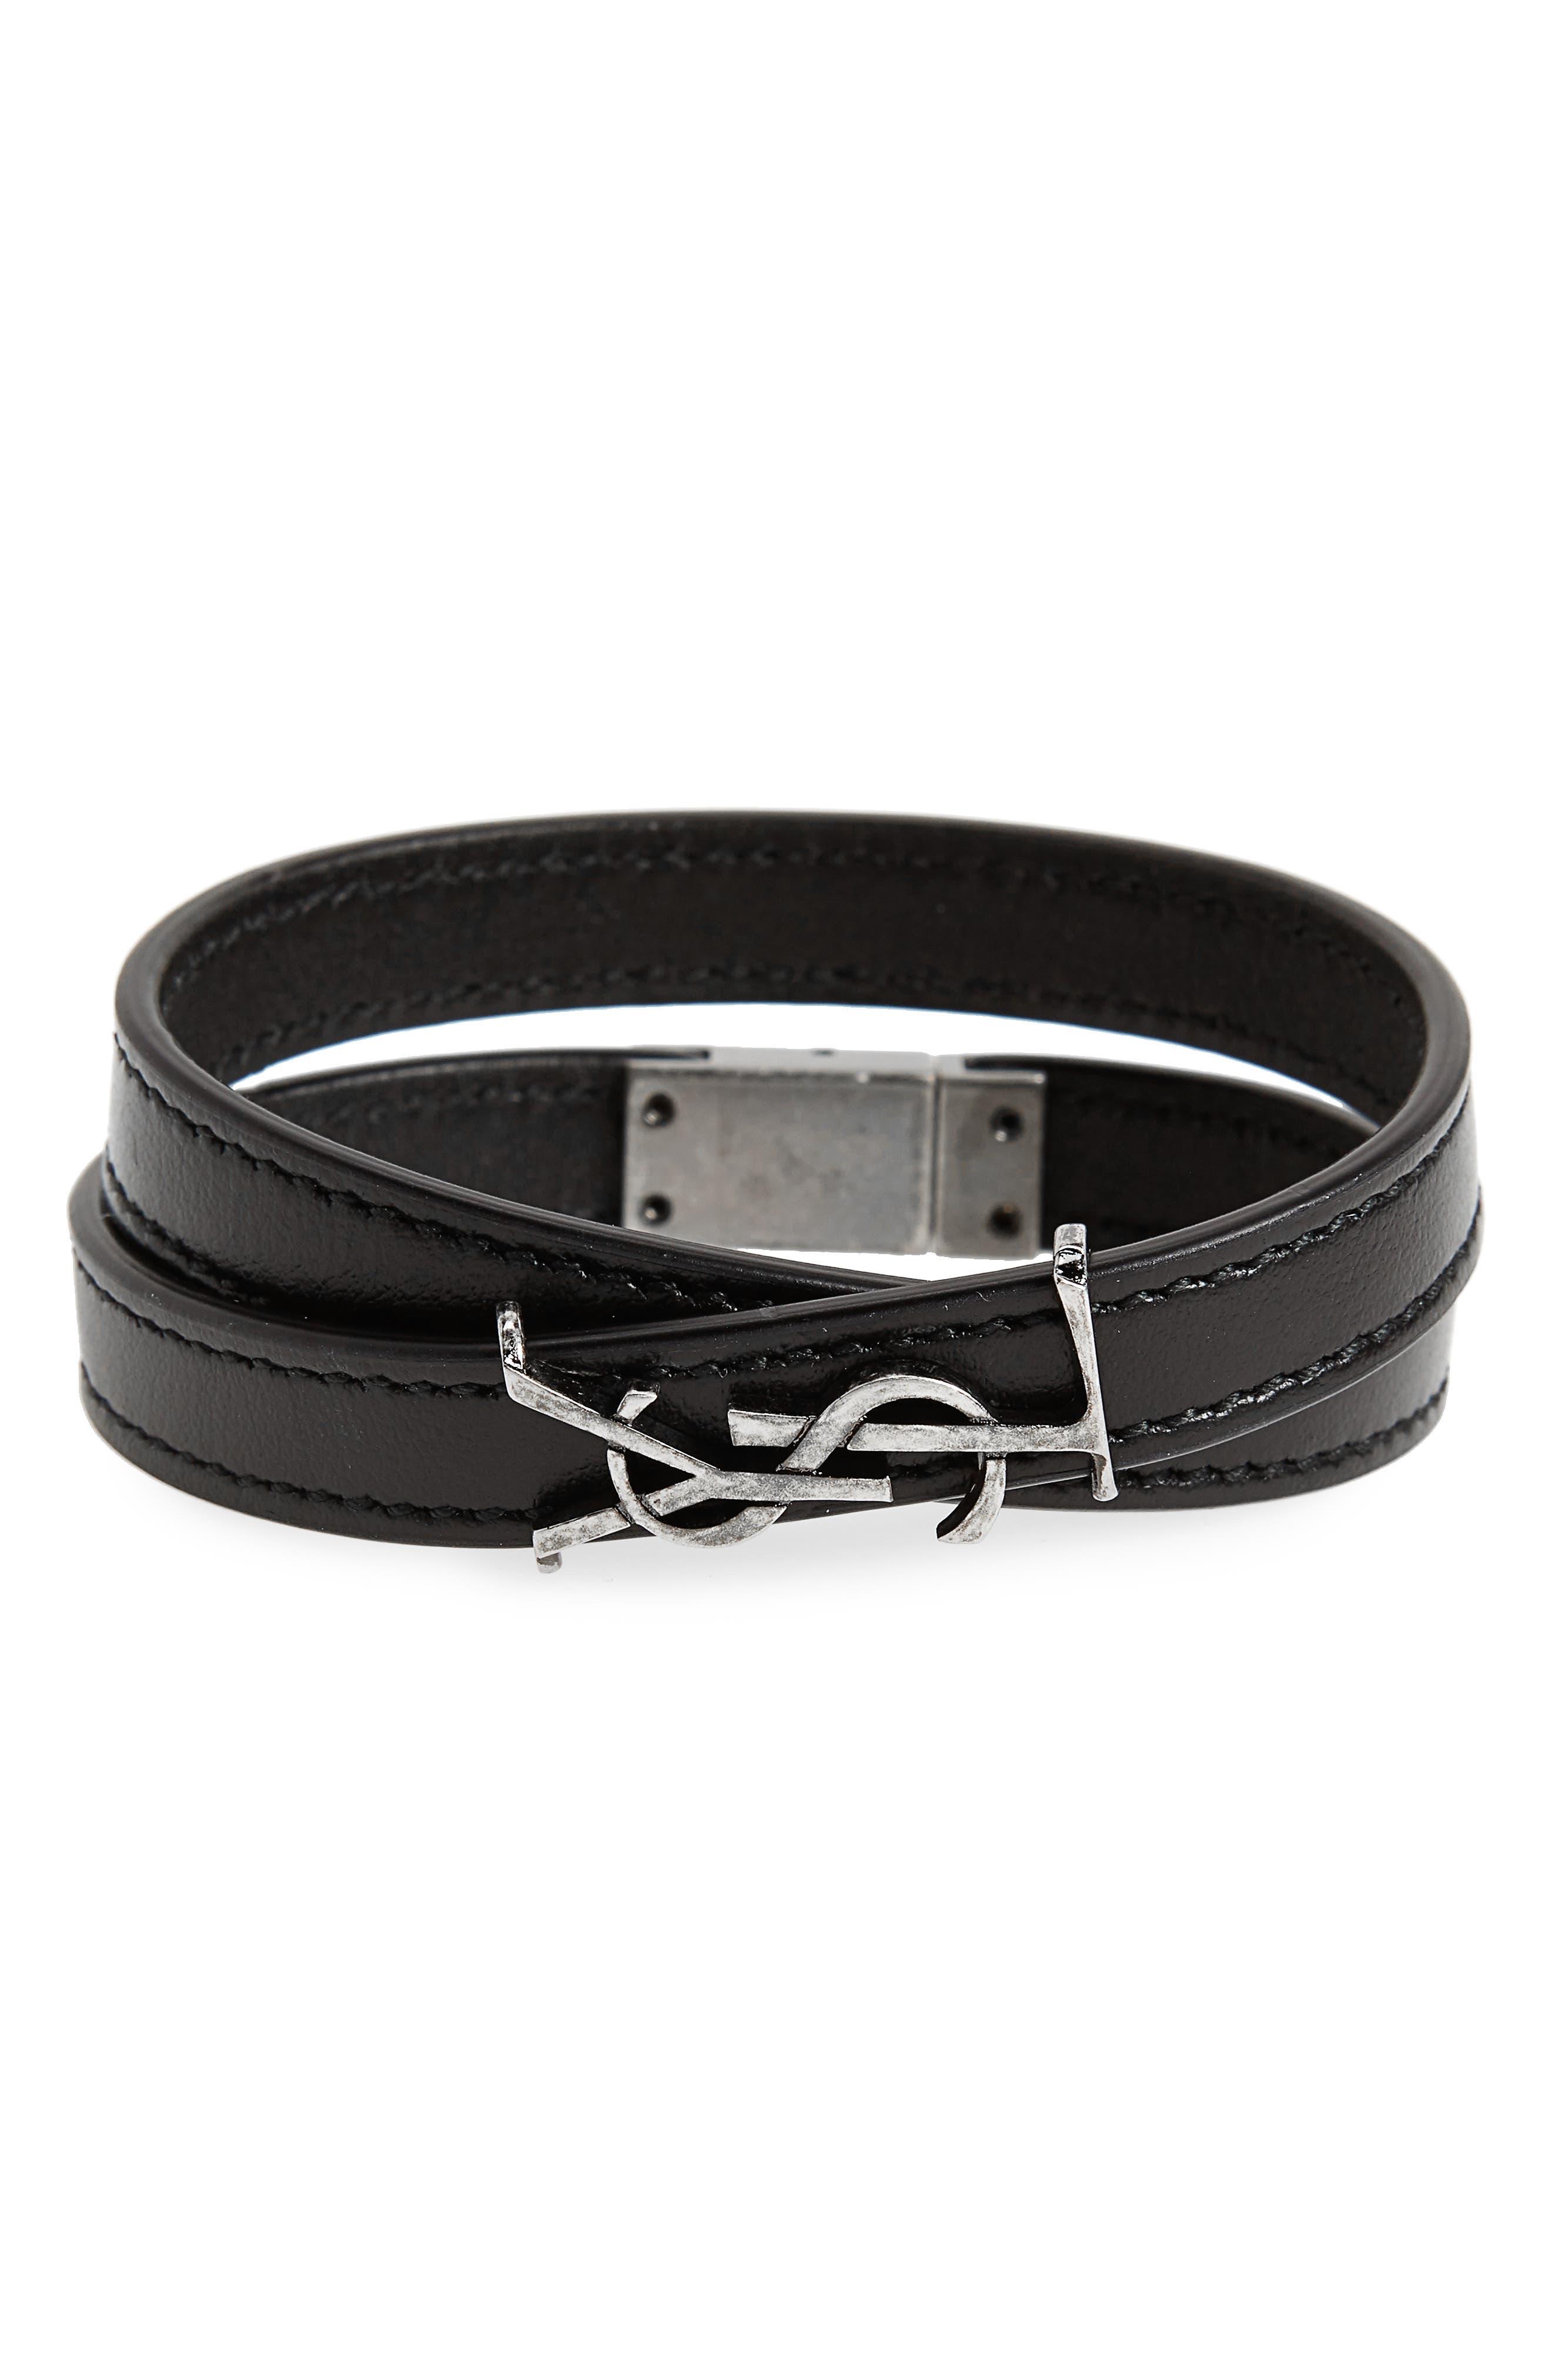 YSL Leather Bracelet,                         Main,                         color, Nero